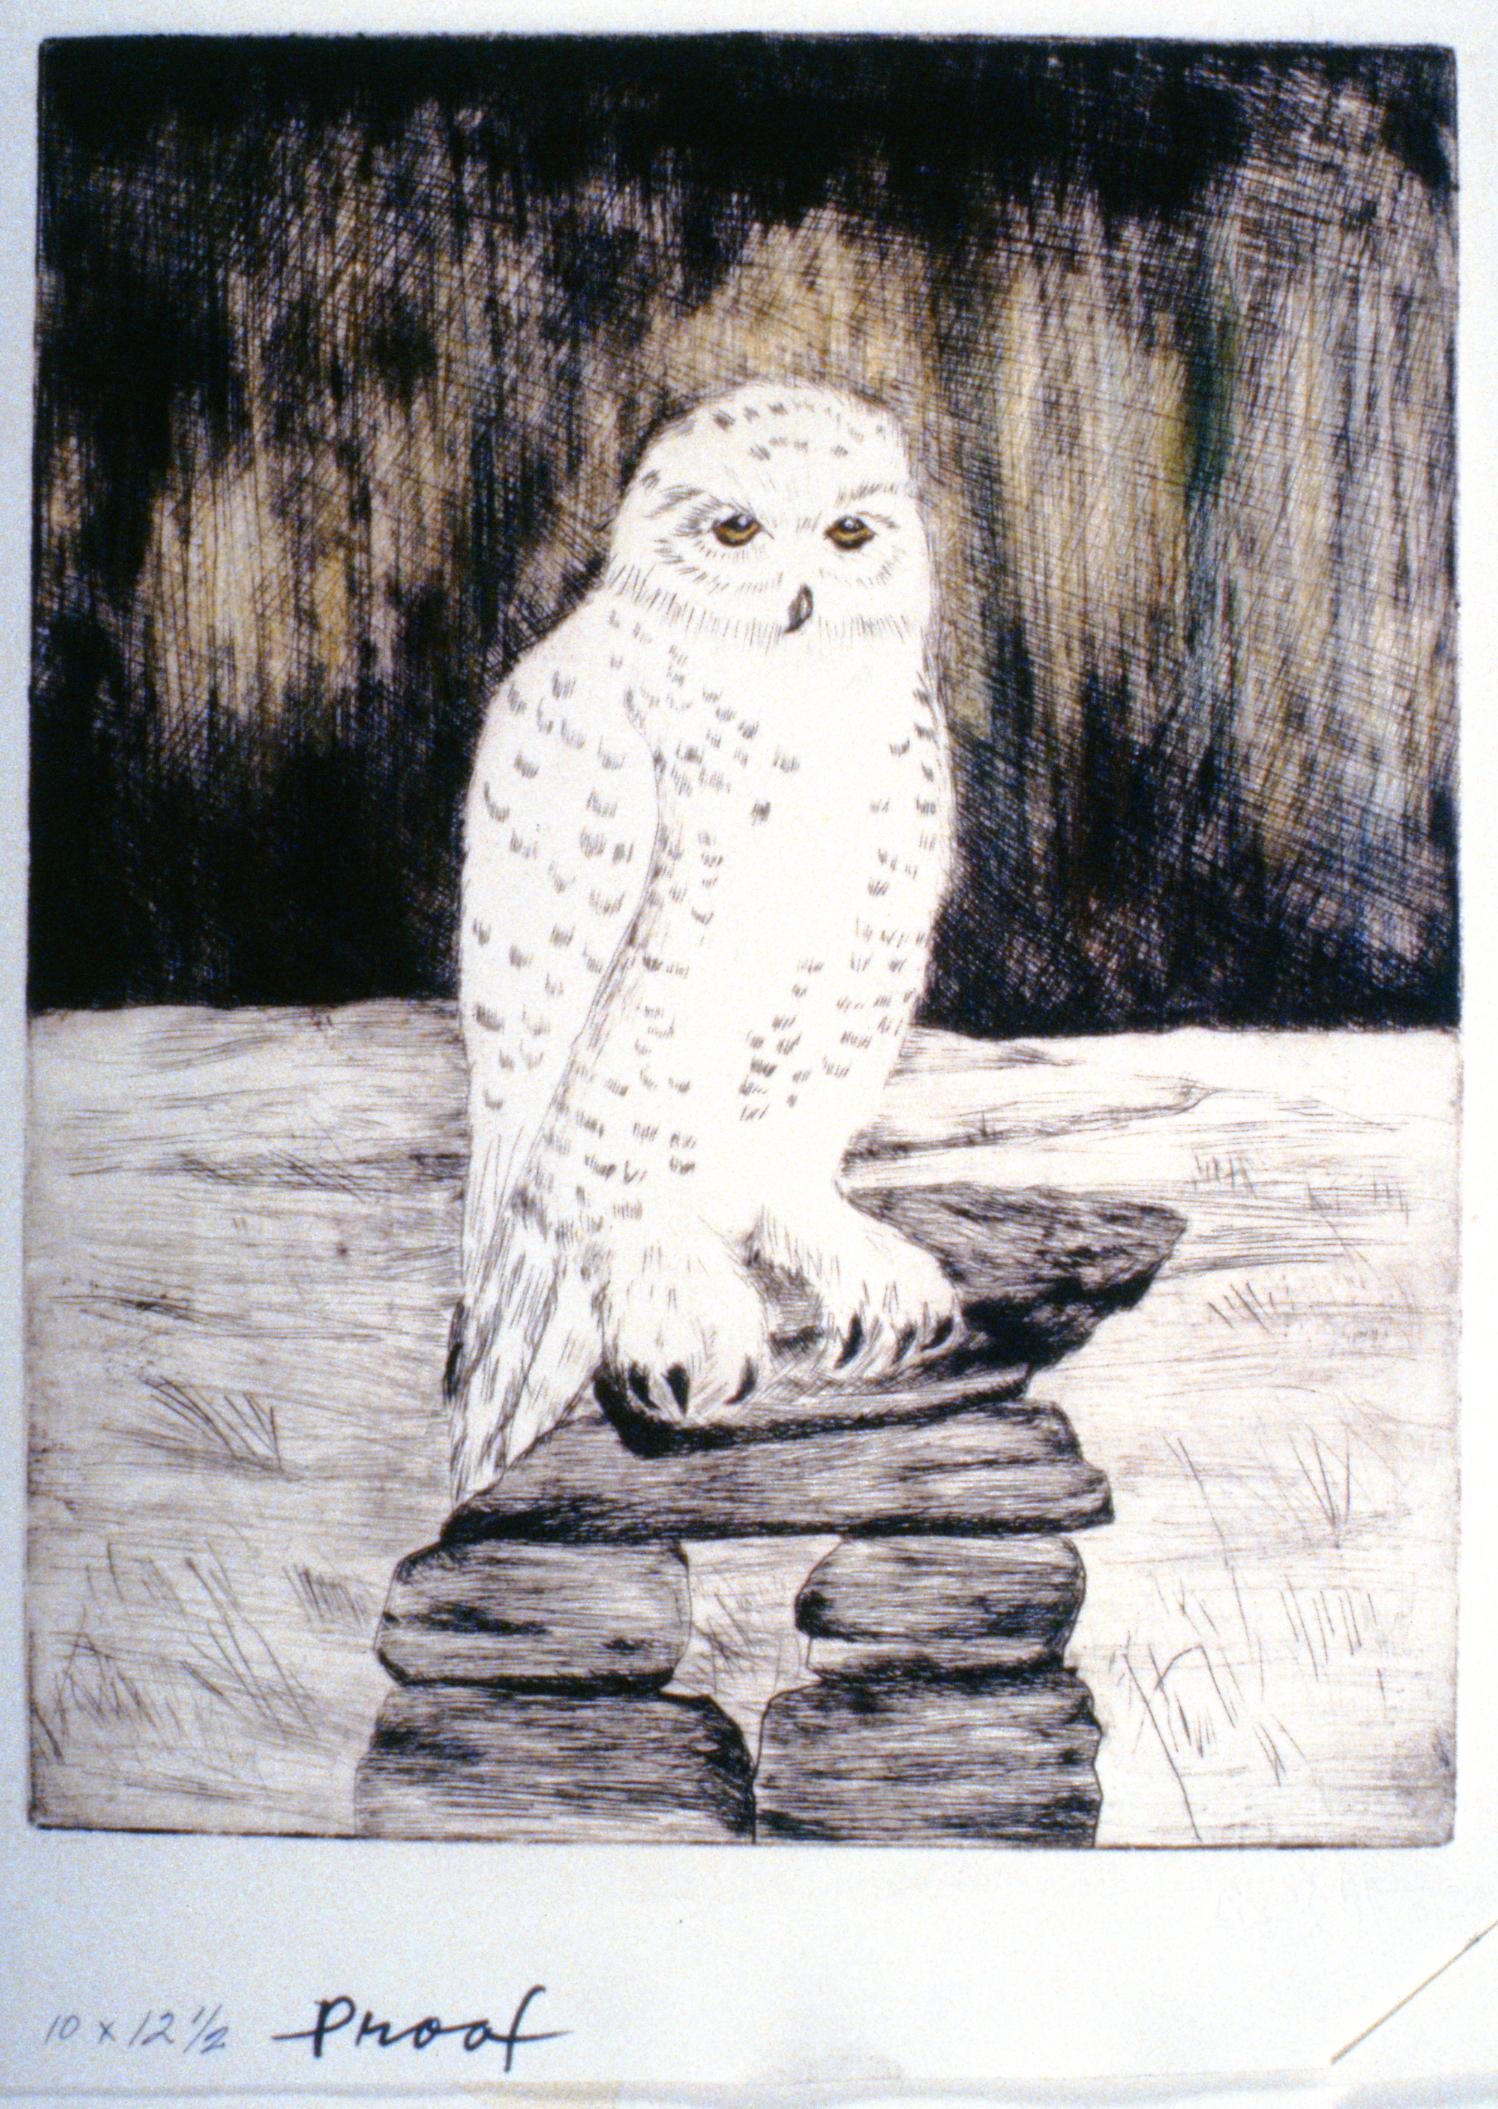 Snowy Owl , 1992, Minn Sjølseth, artist proof, 30 x 24cm, 1996.02.03